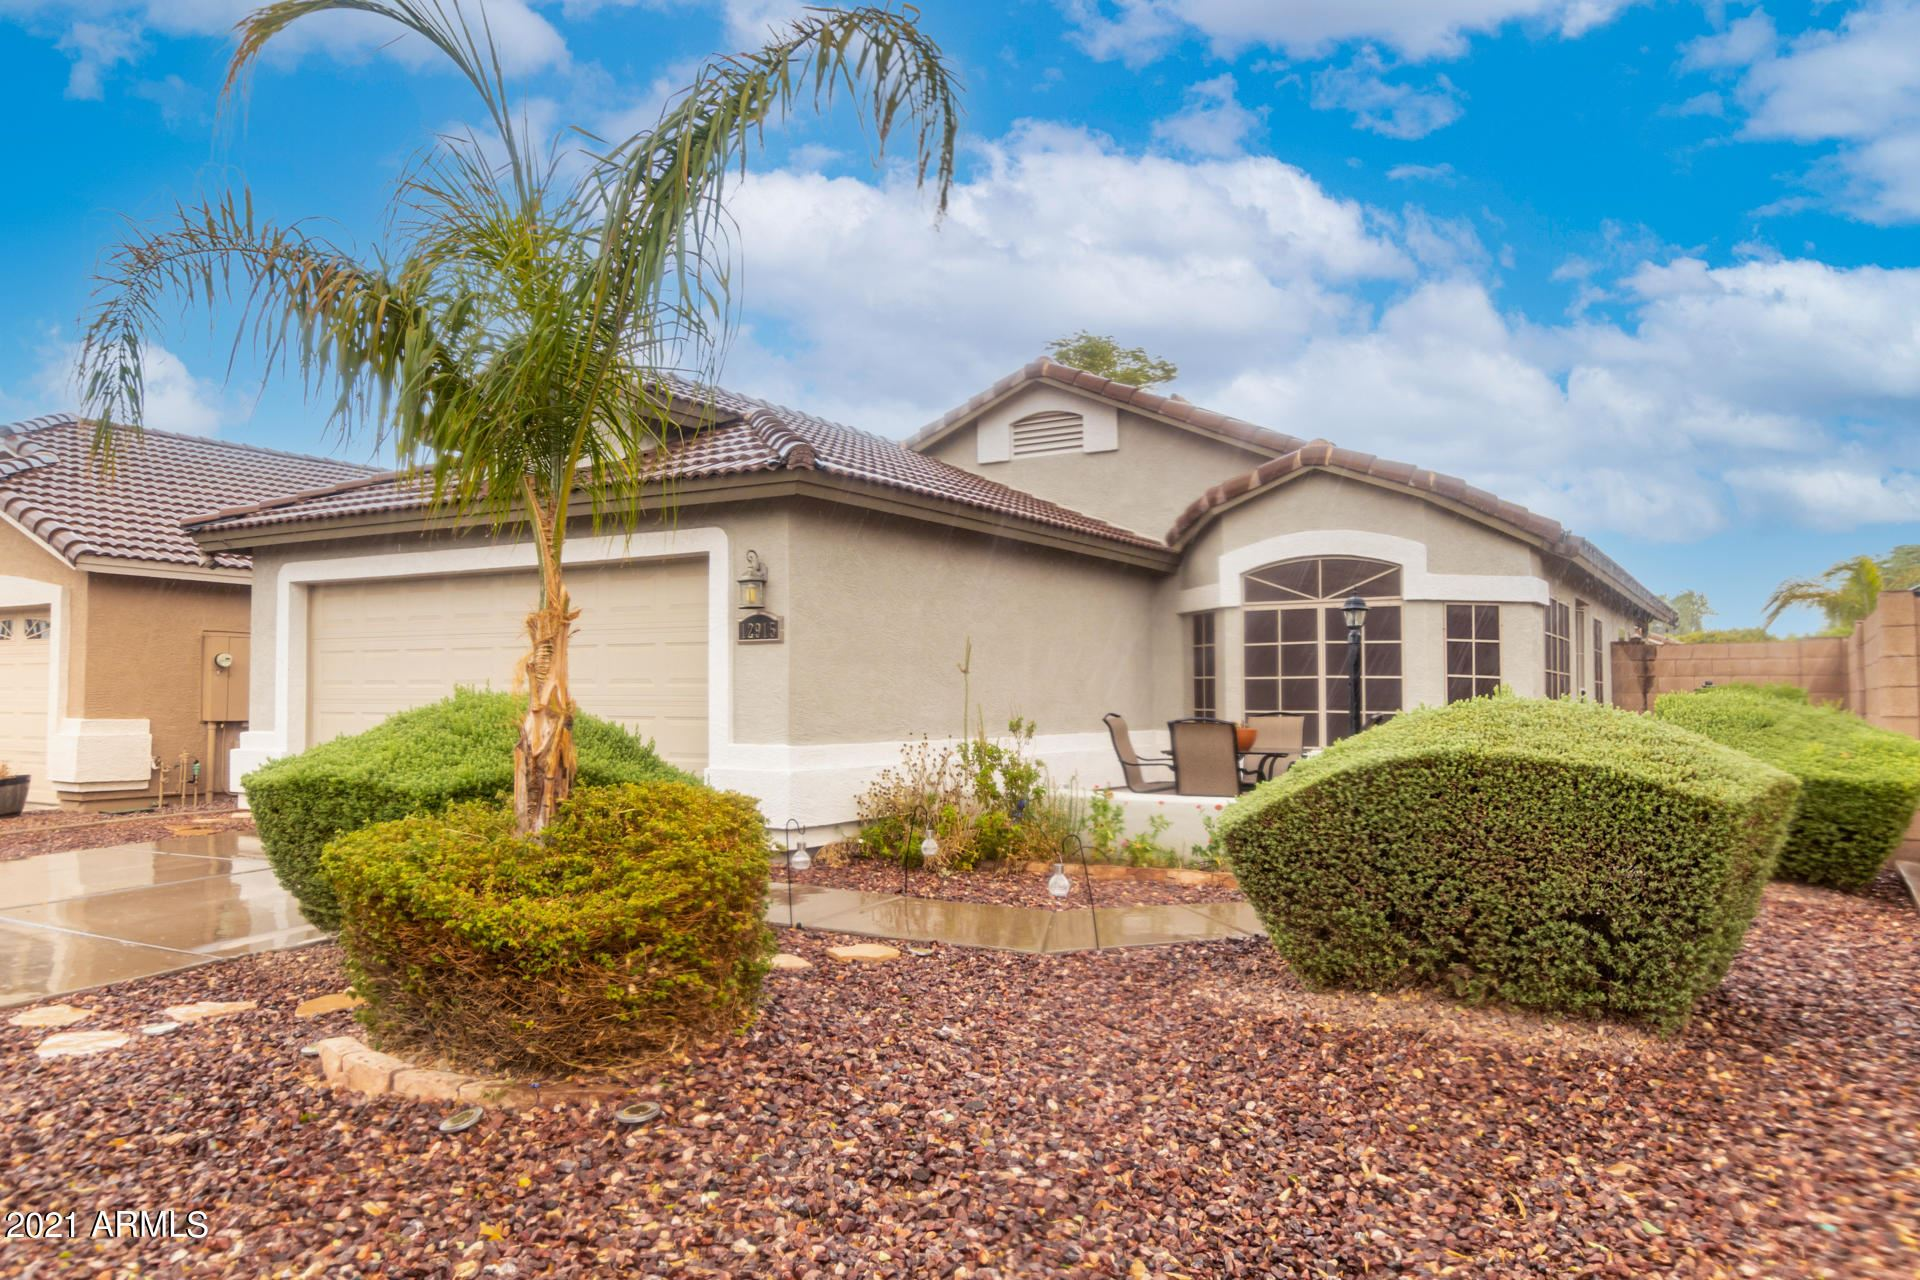 Photo of 12915 W SHARON Drive, El Mirage, AZ 85335 (MLS # 6265663)